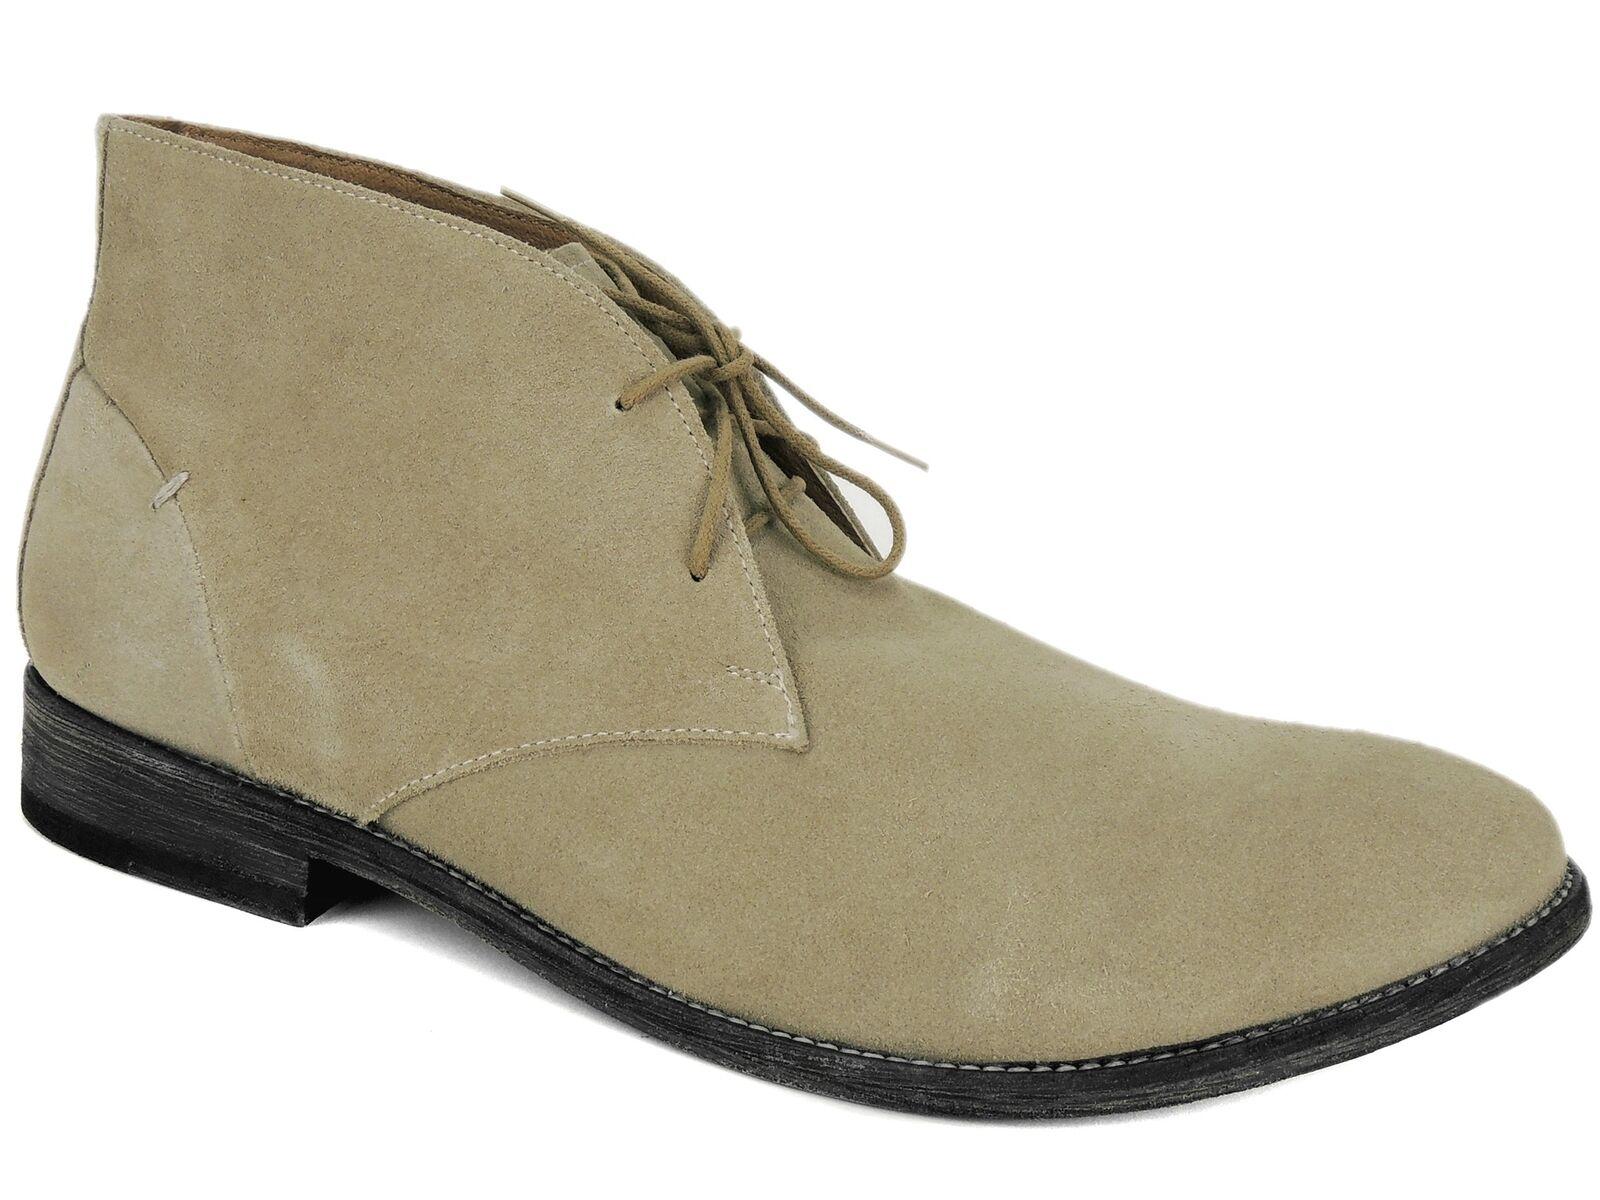 JD Fisk Men's Cormac Chukka Laceup Boots Khaki Suede Size 12 M